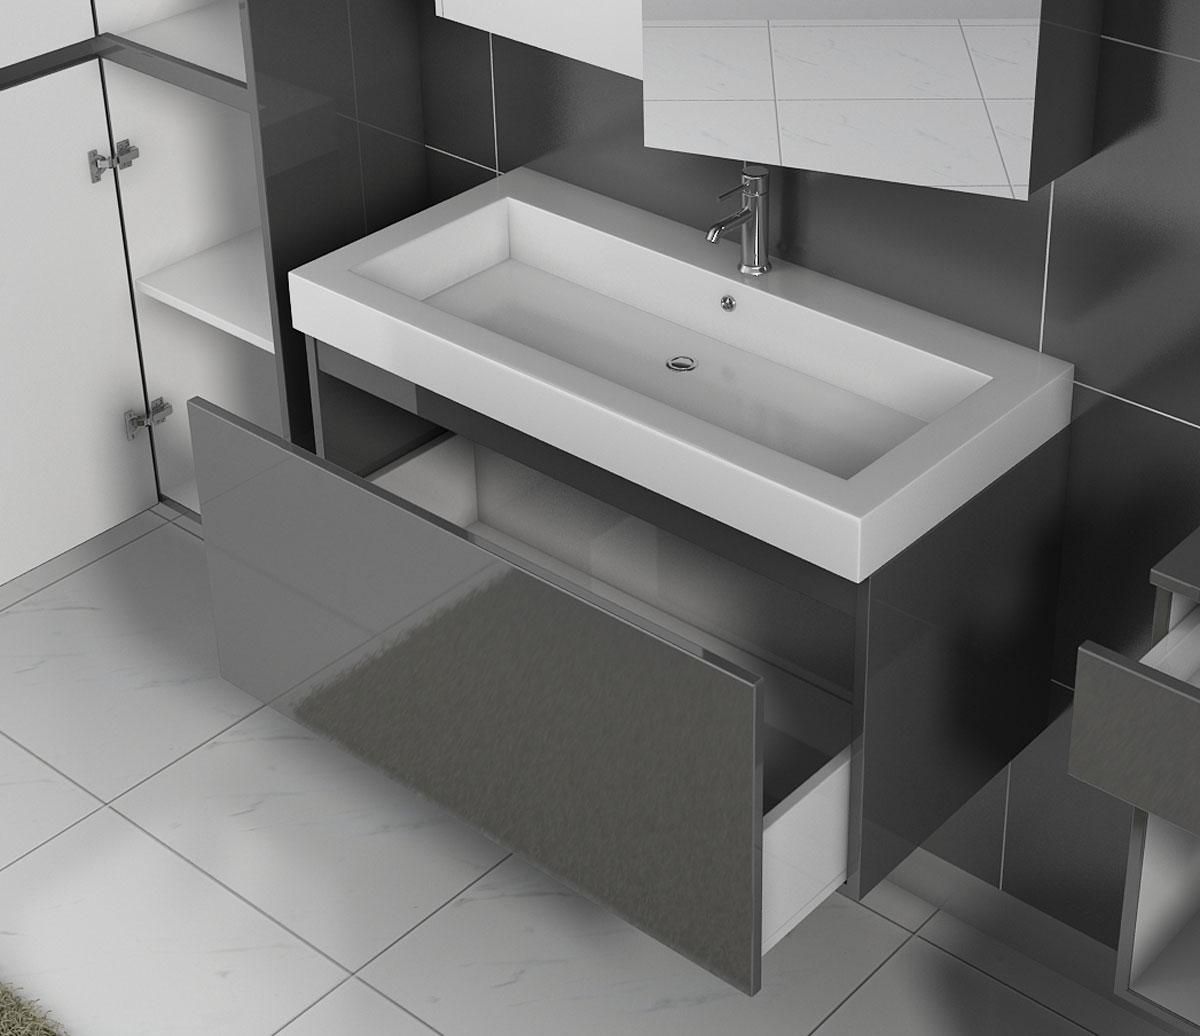 sam badm bel 5tlg set softclose grau hochglanz parma 100 cm demn chst. Black Bedroom Furniture Sets. Home Design Ideas